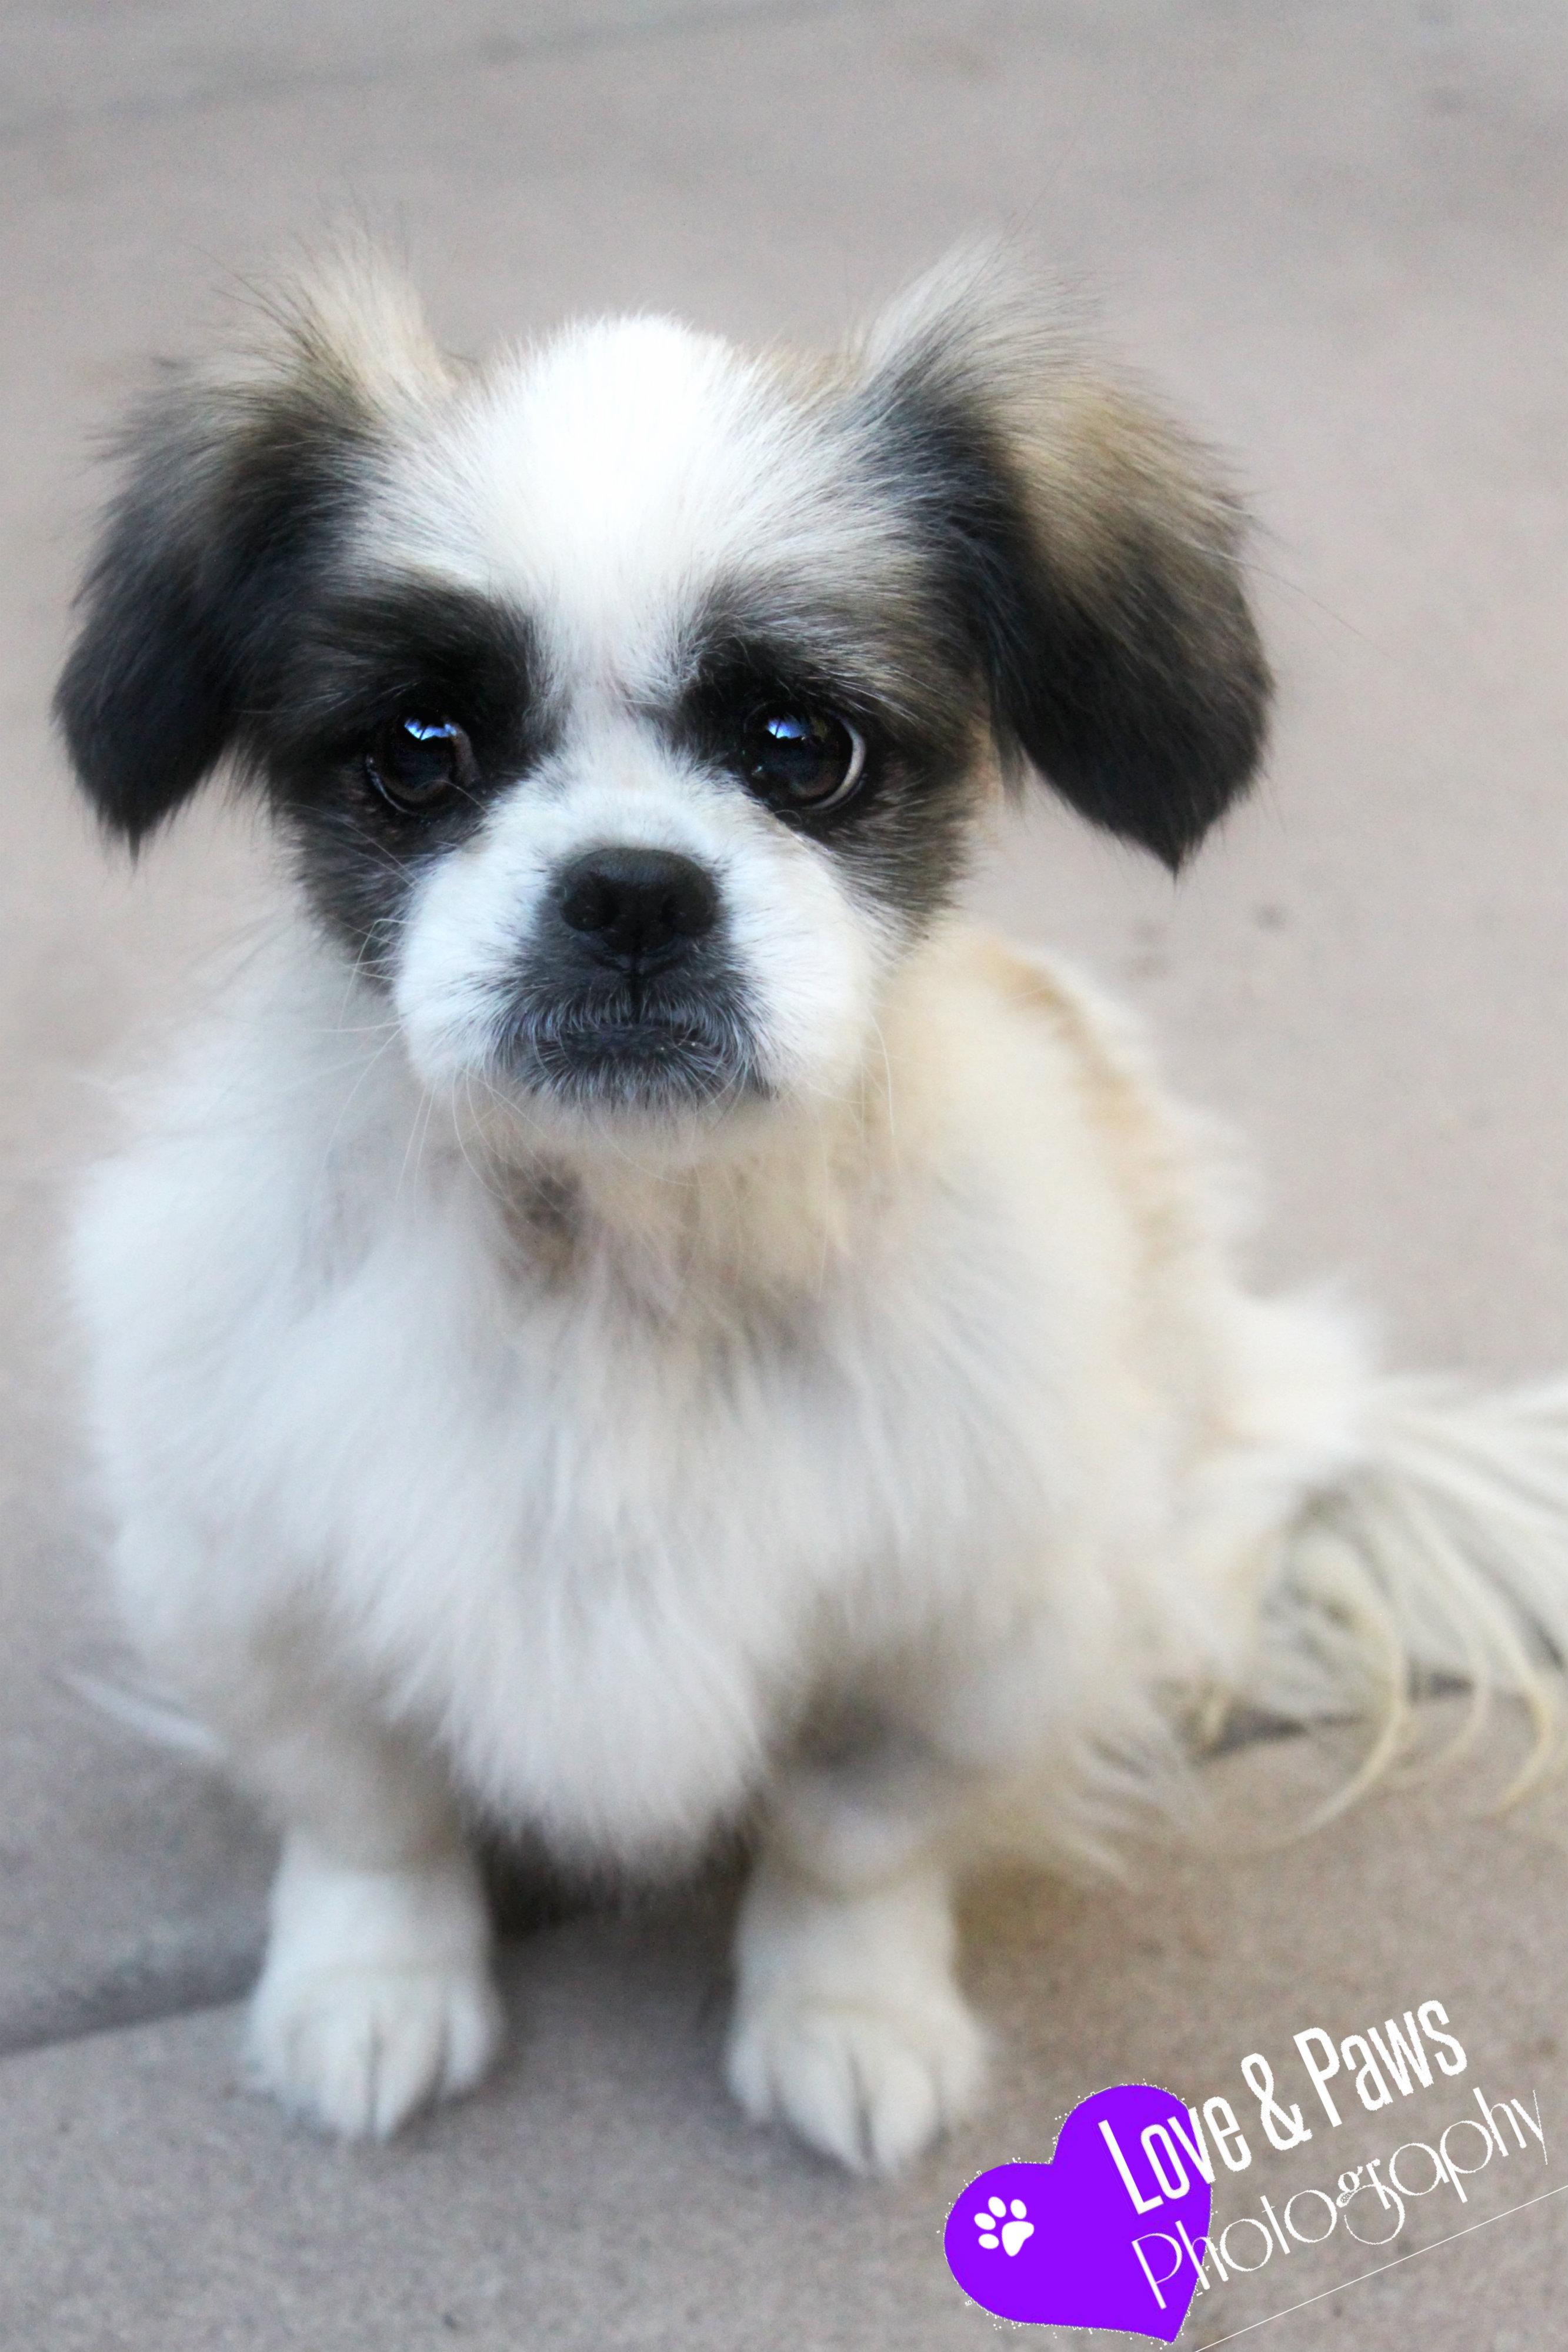 in need dog rescue in phoenix arizona saving sick and